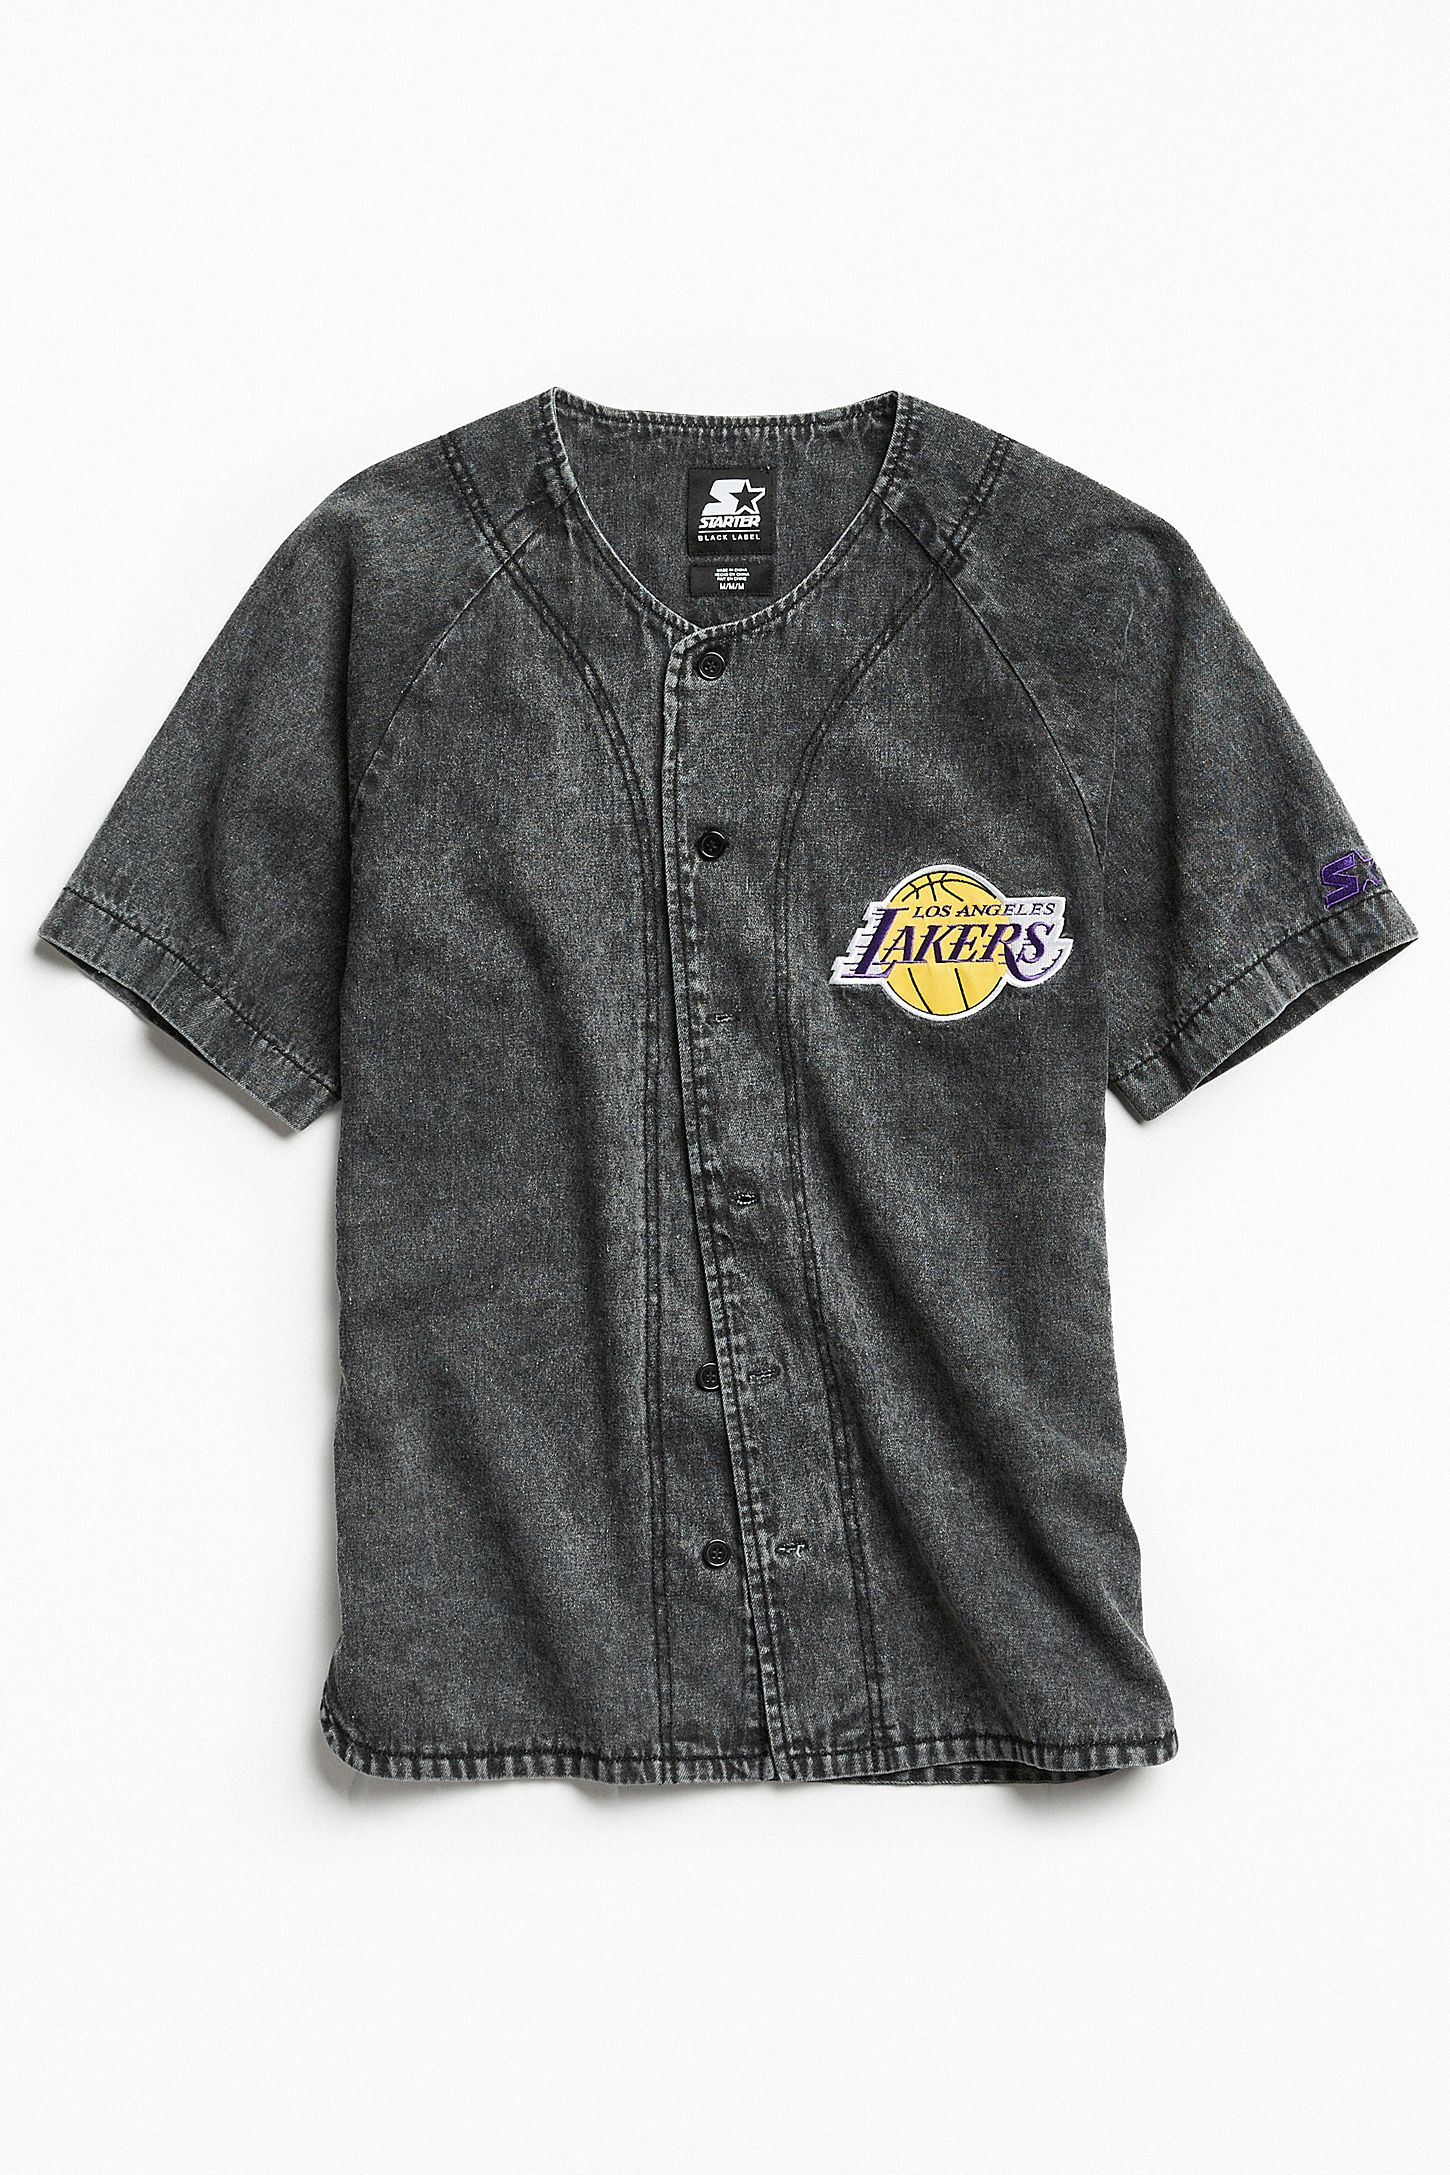 7b0bc361bbae Starter Black Label + UO NBA Los Angeles Lakers Denim Baseball Shirt ...